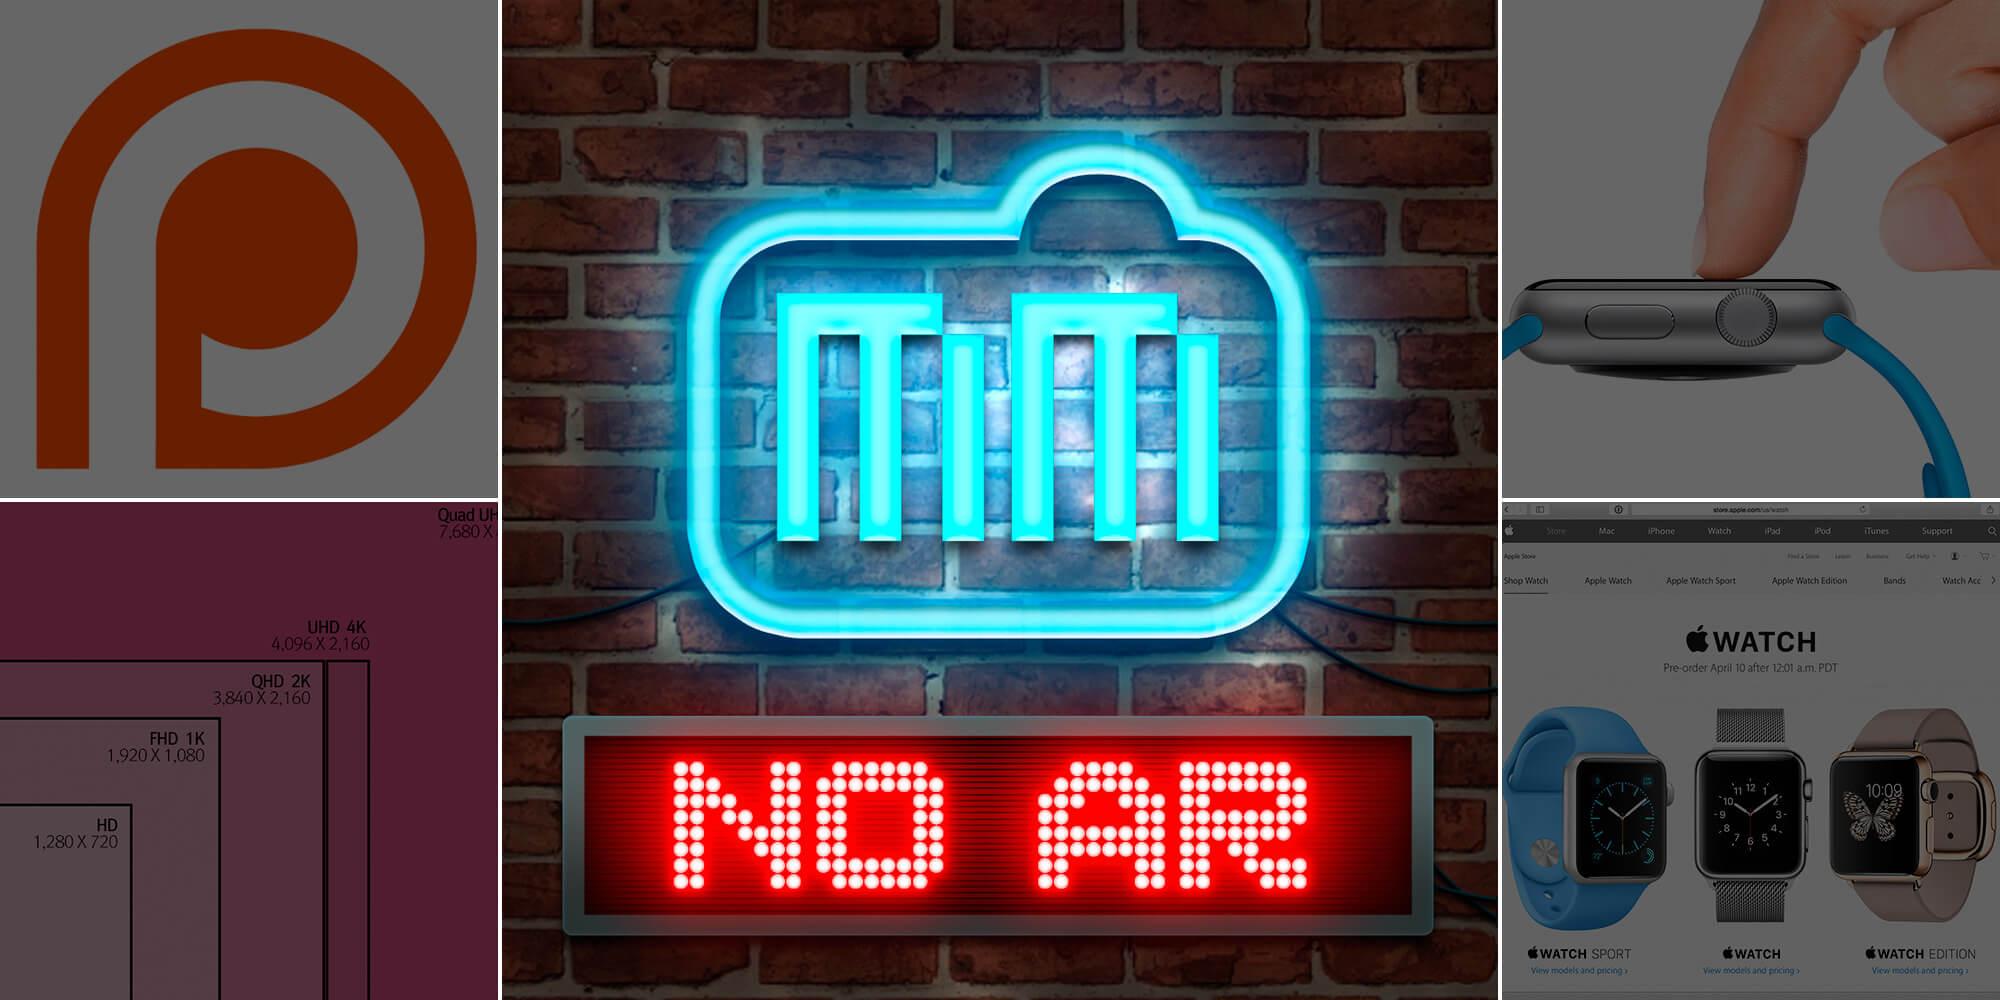 Capa do podcast #125